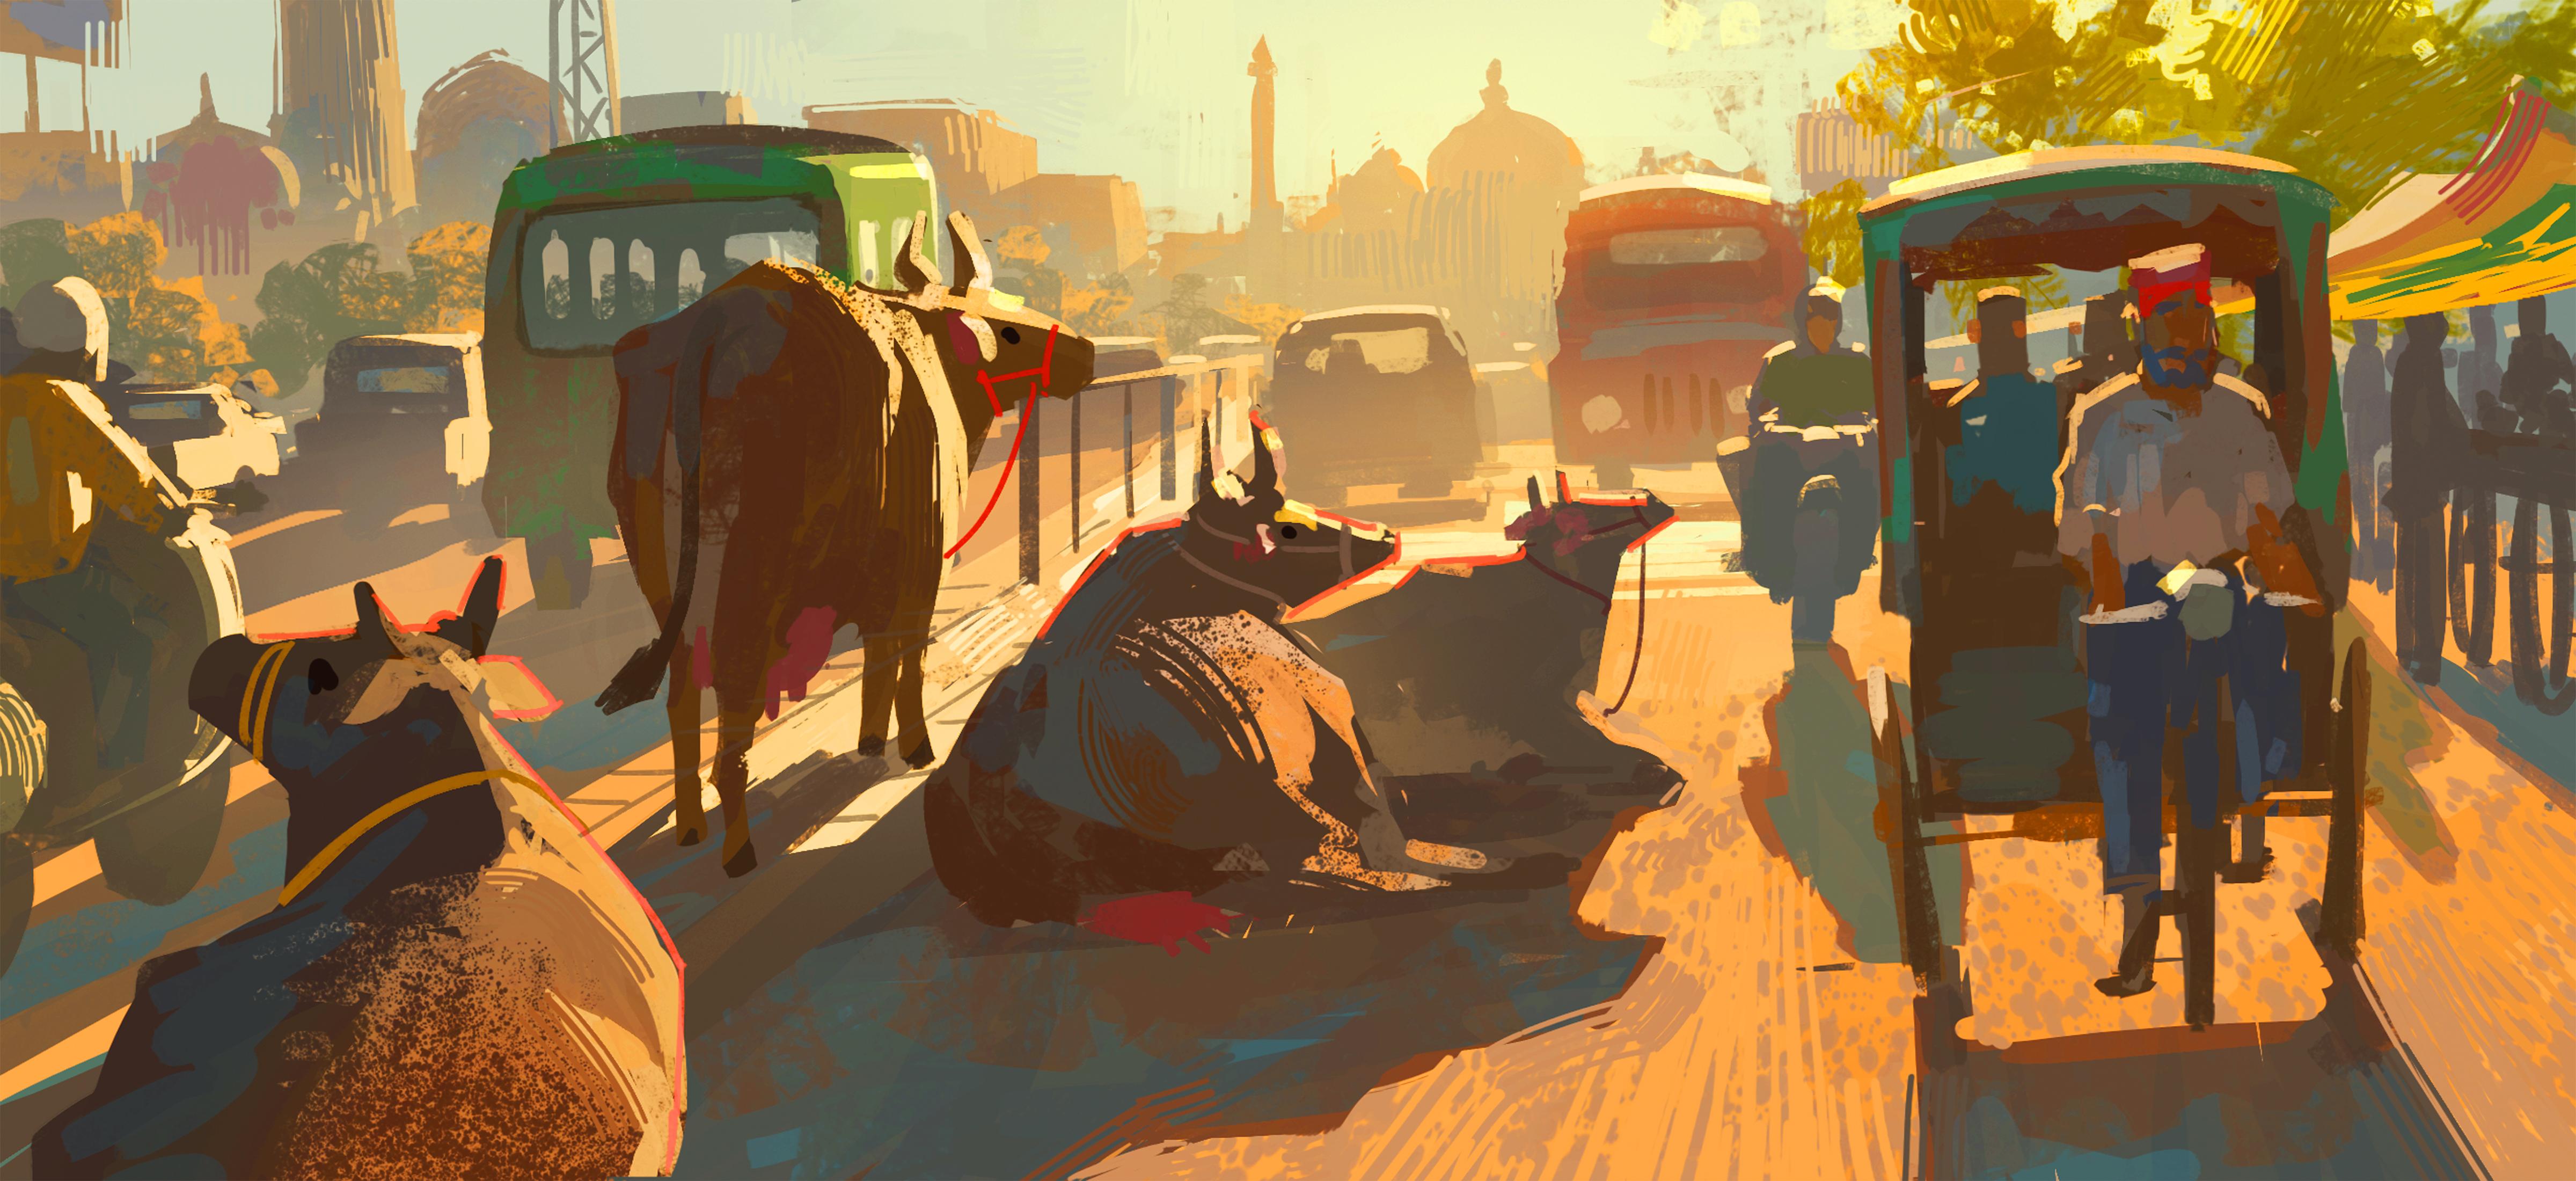 street cows_highres